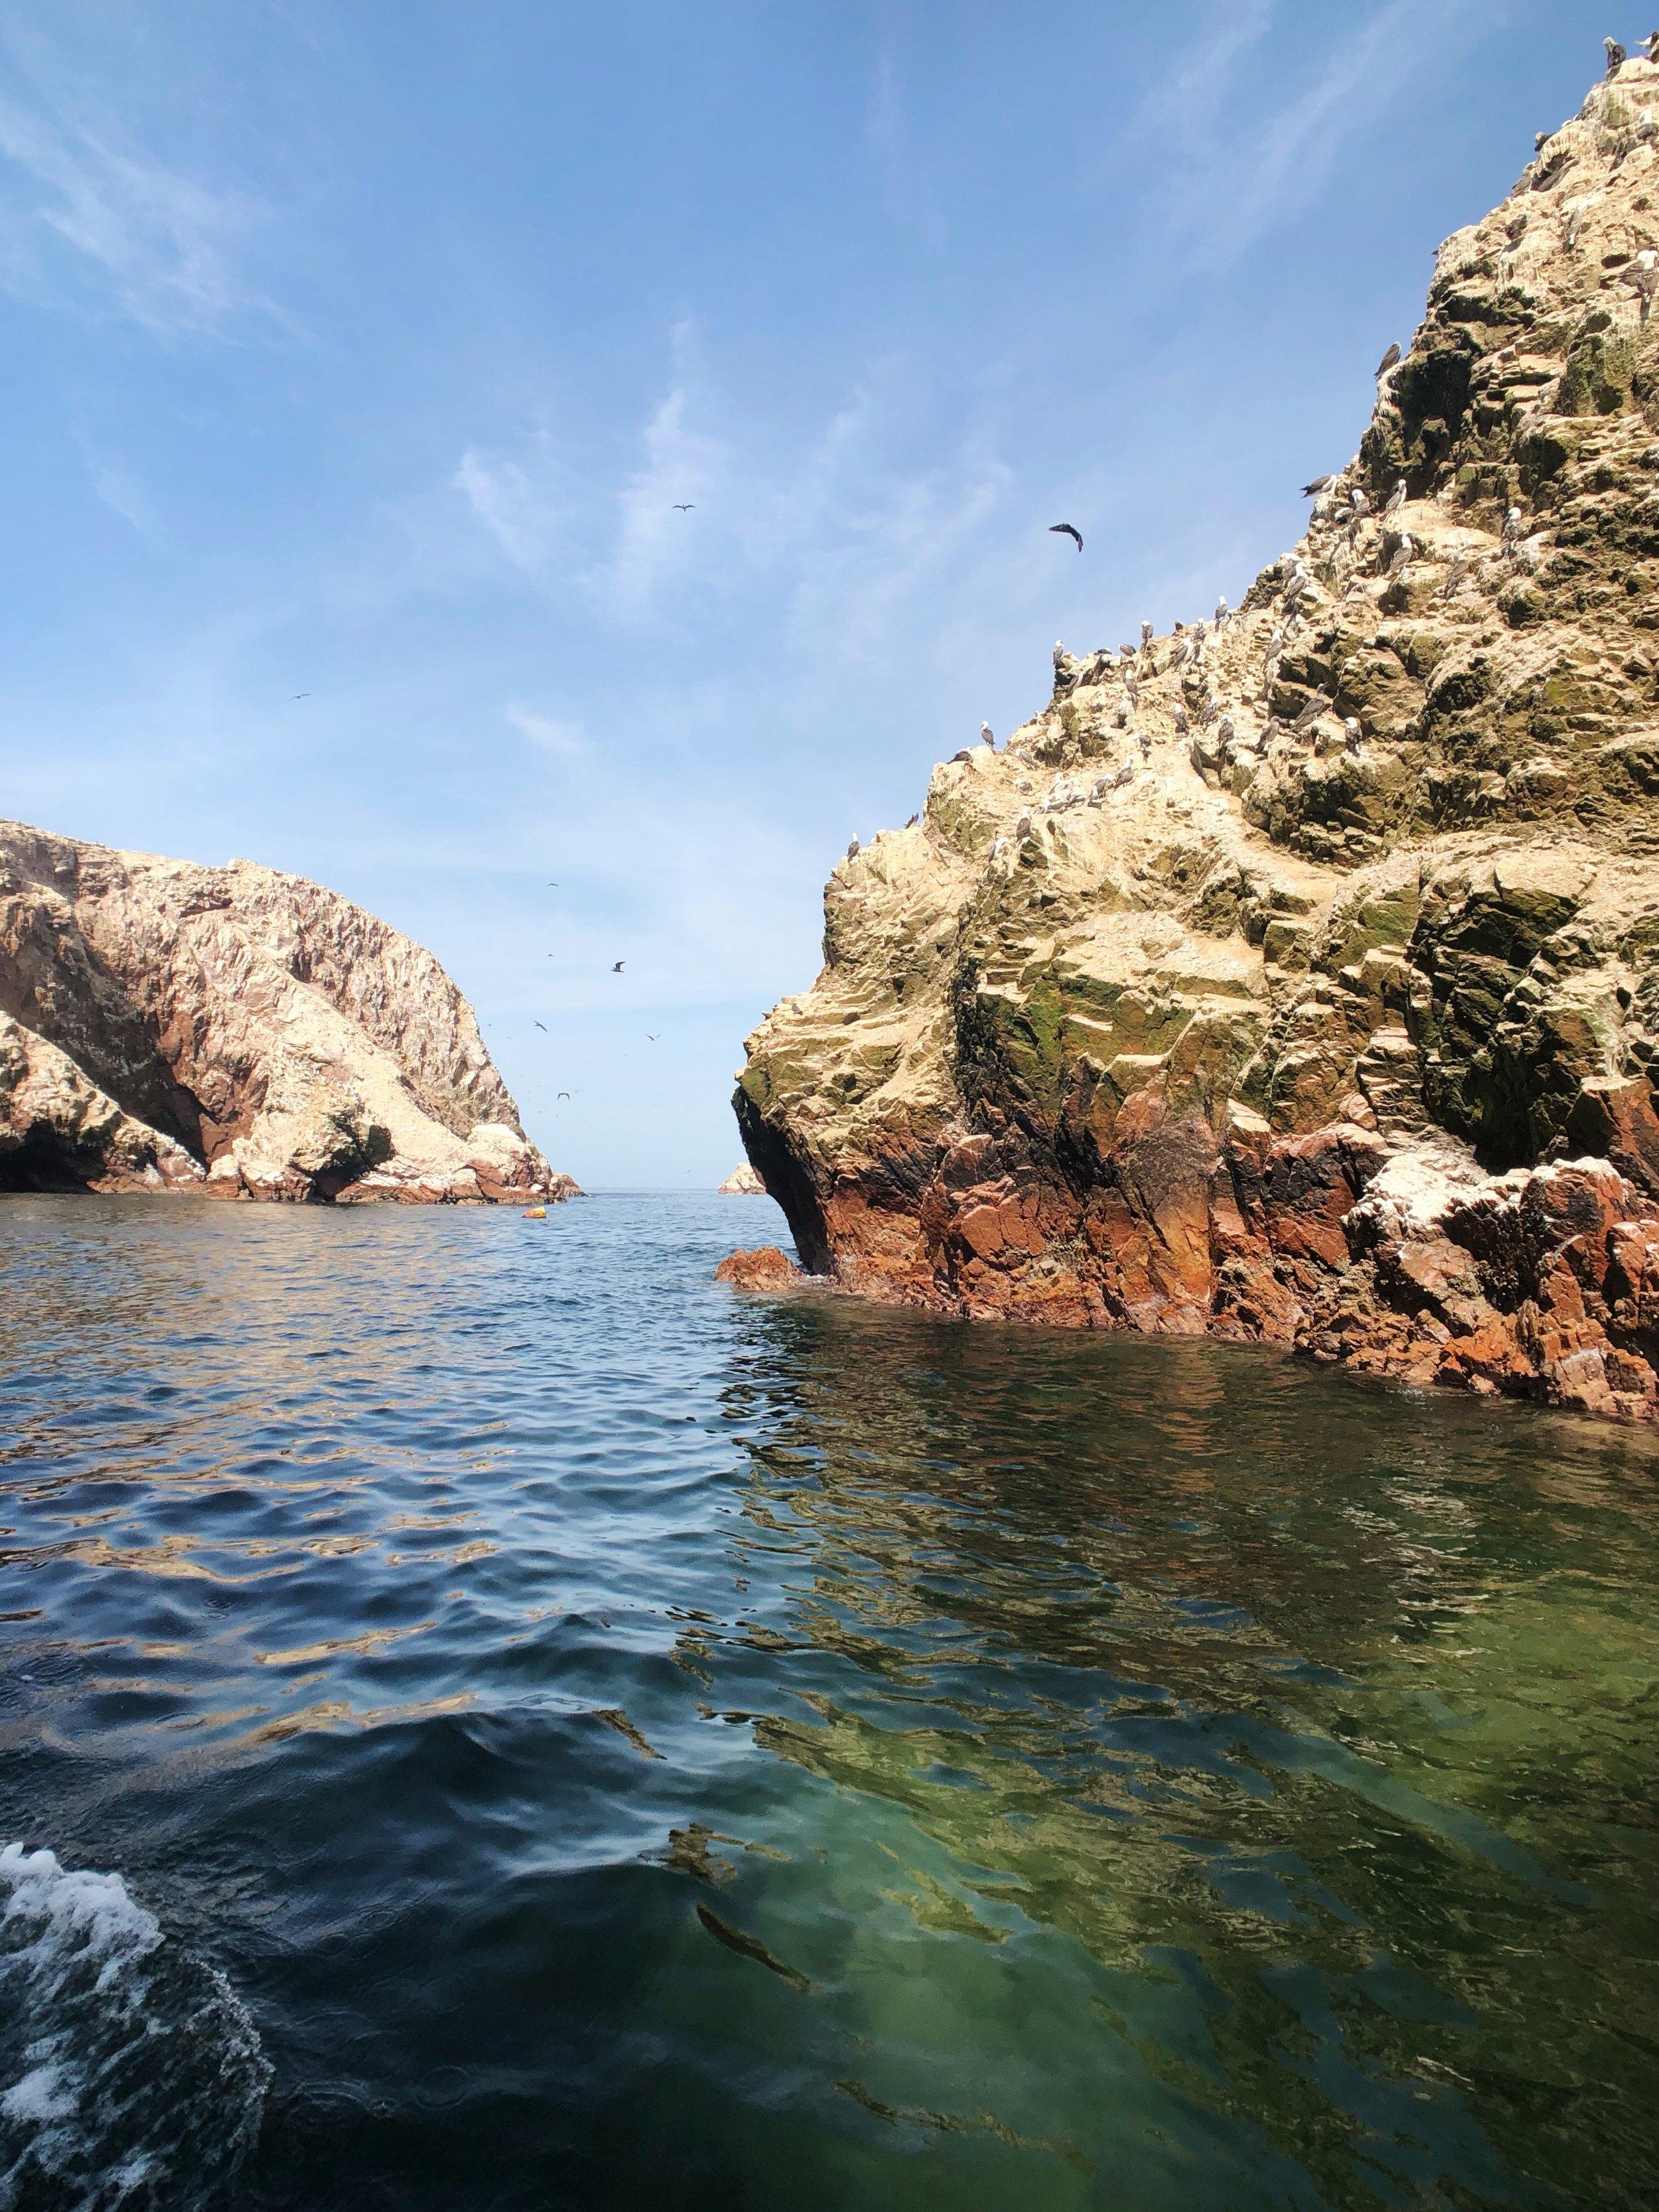 Ballestas Islands - paracas-peru - travel -tips - boat - south america - 3